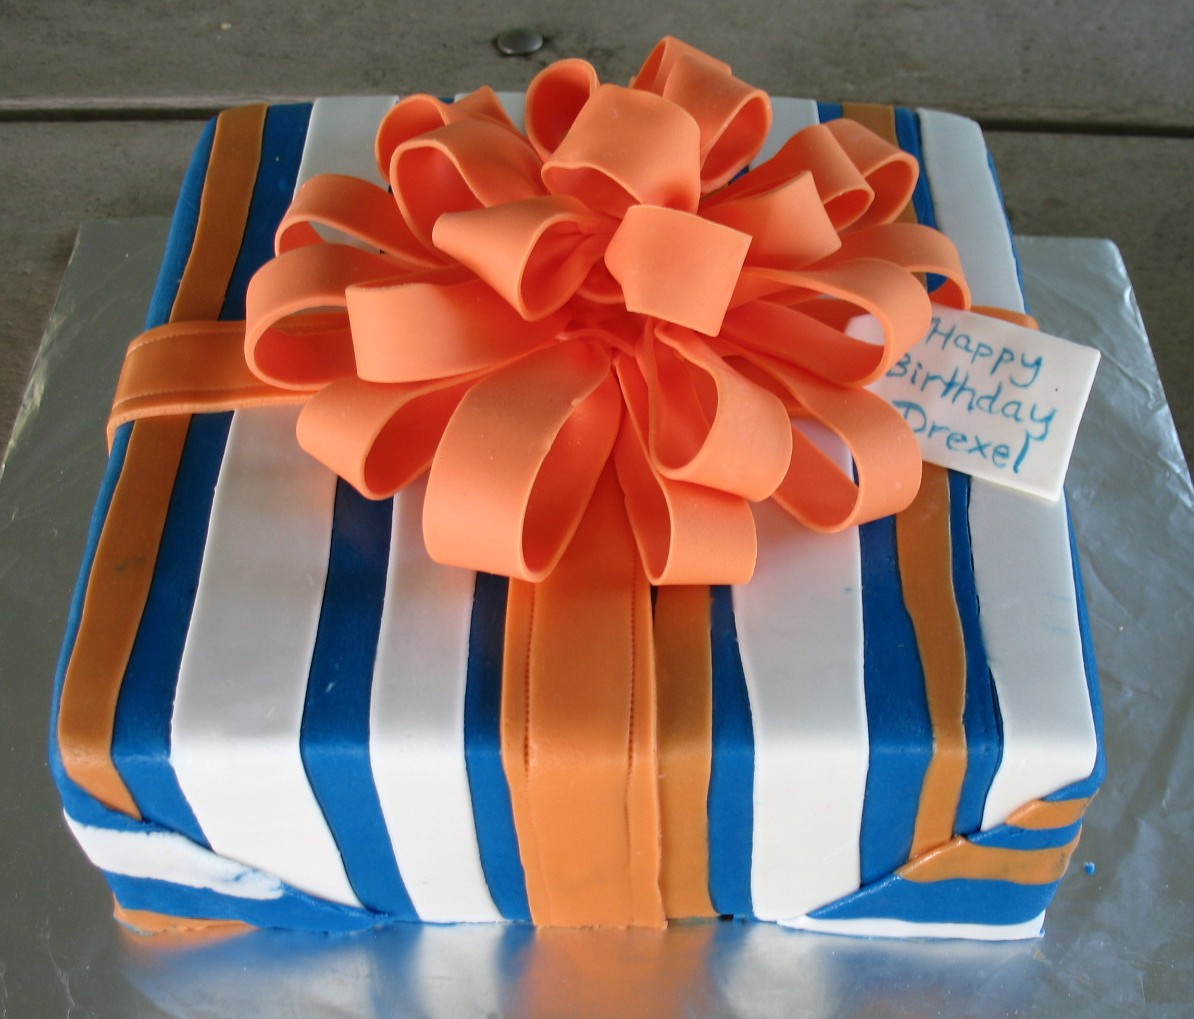 Birthday Present Cake Blue Ridge Buttercream